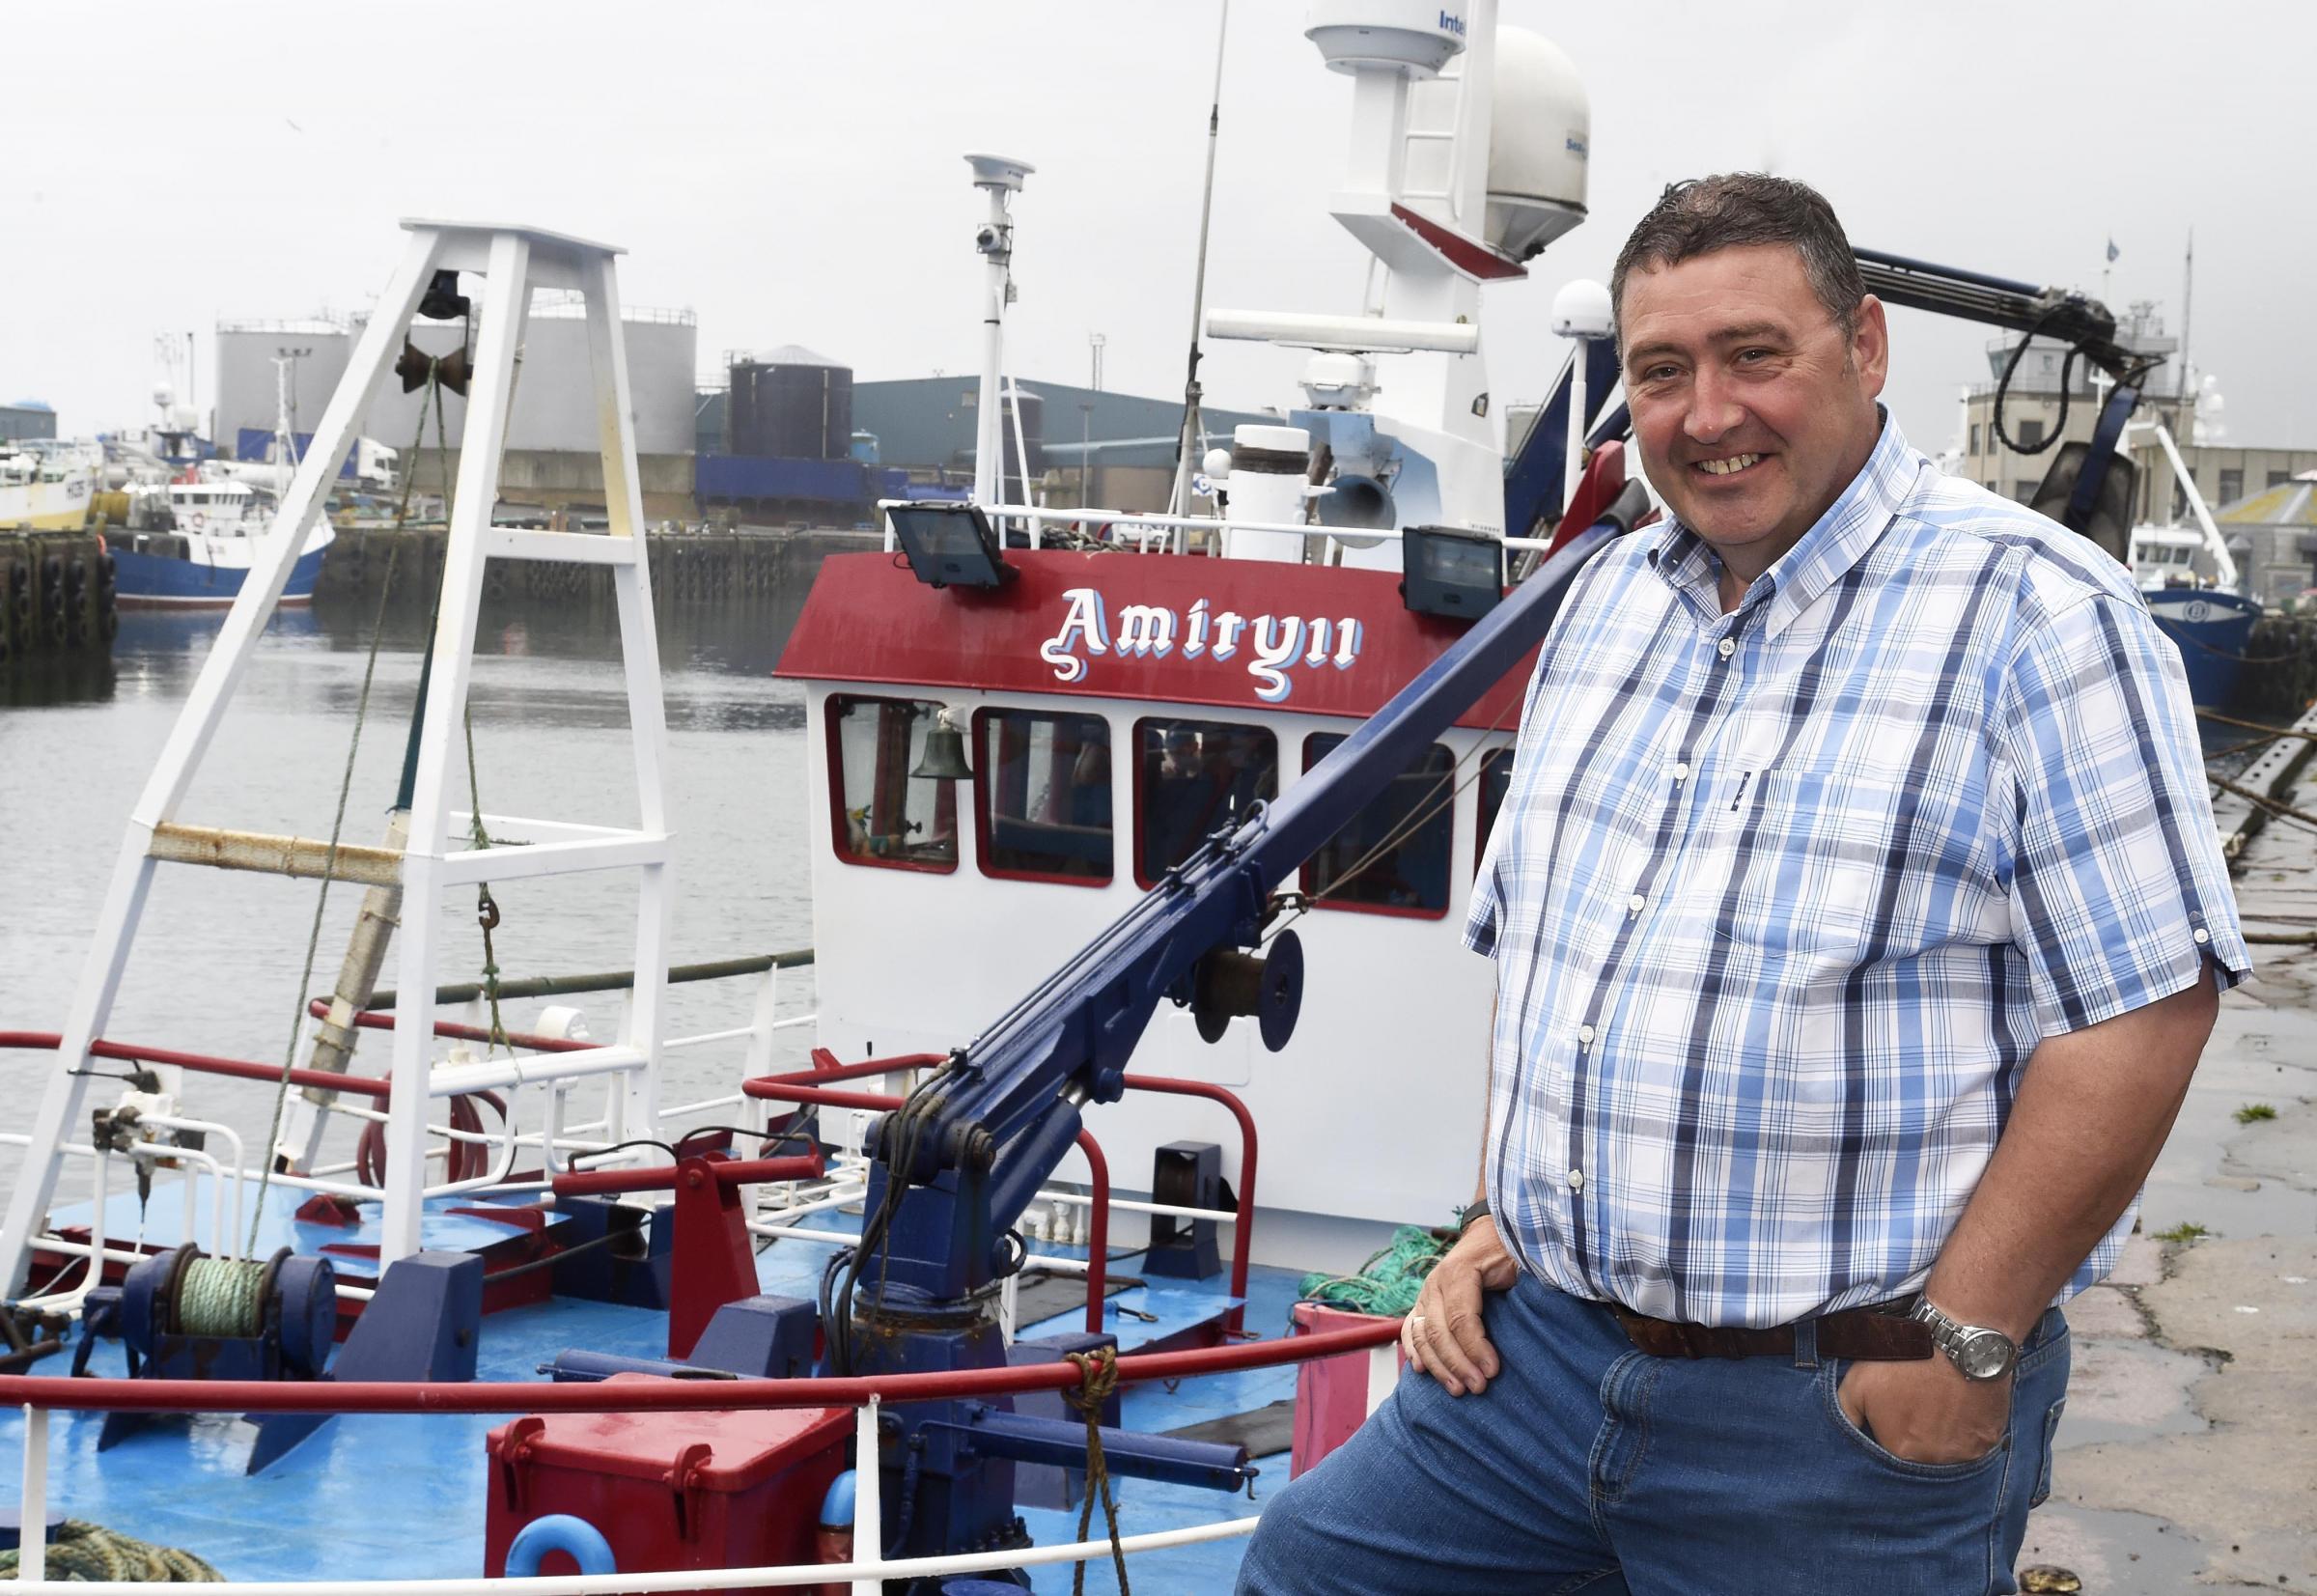 Betrayal of Scottish fishermen by Boris Johnson comes as no surprise